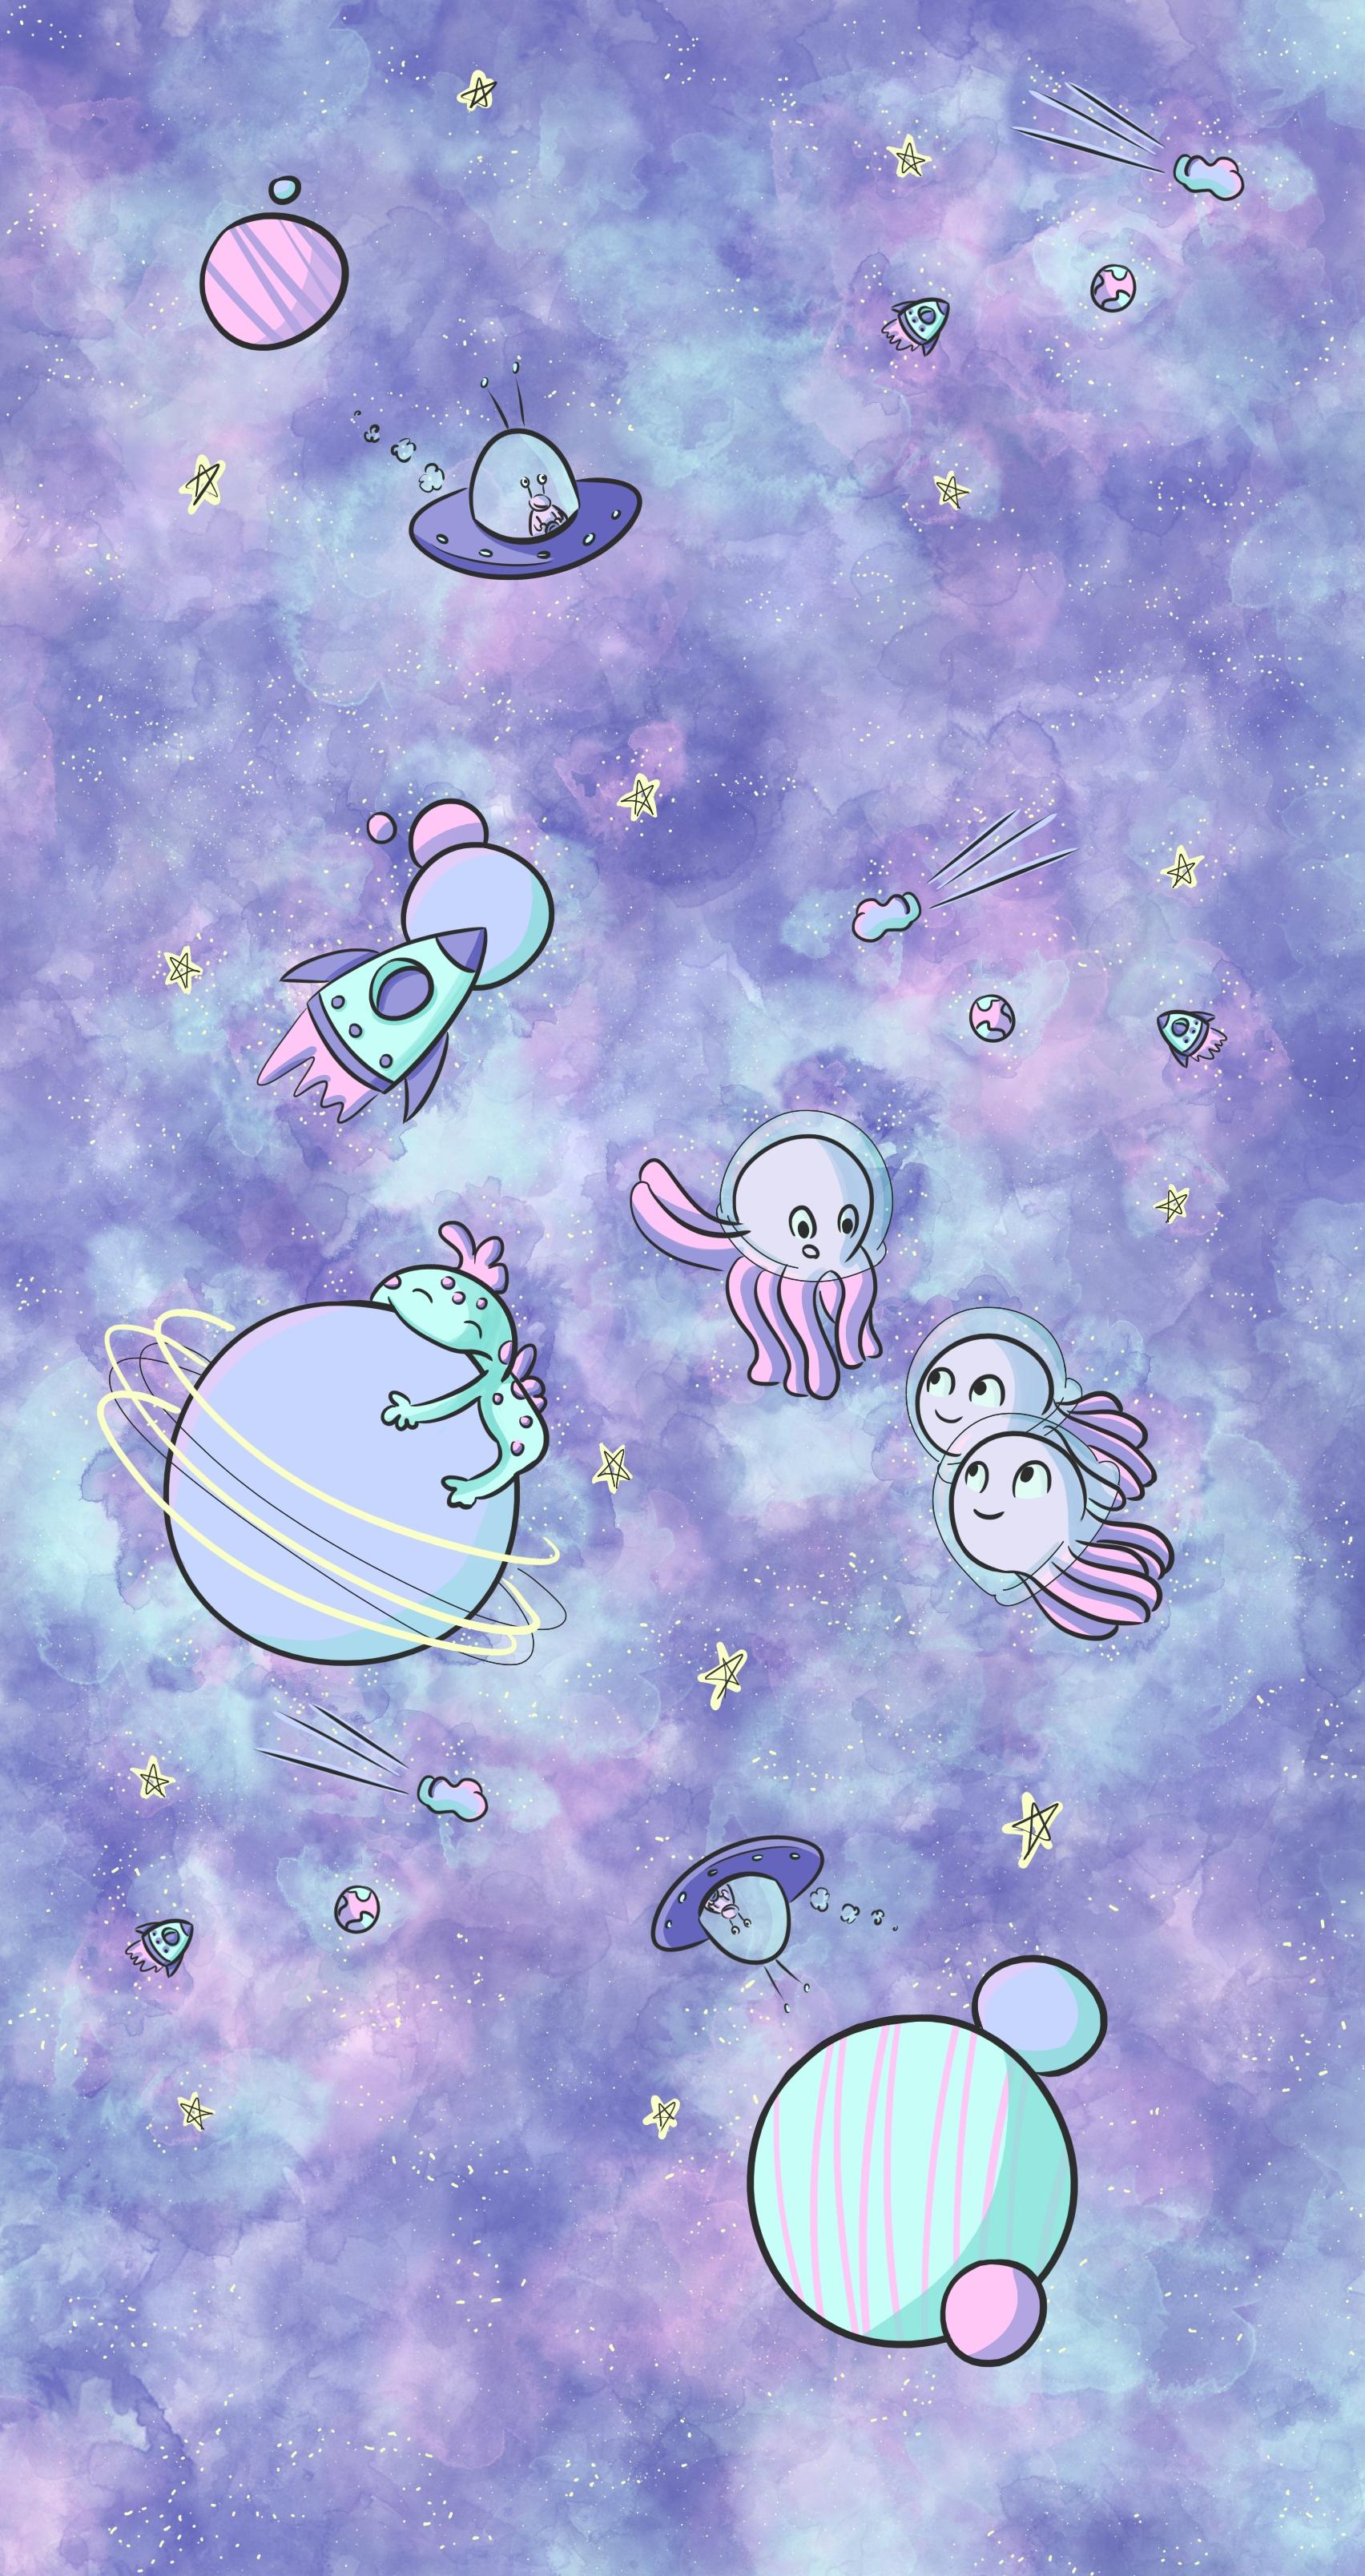 Octopus Astronauts